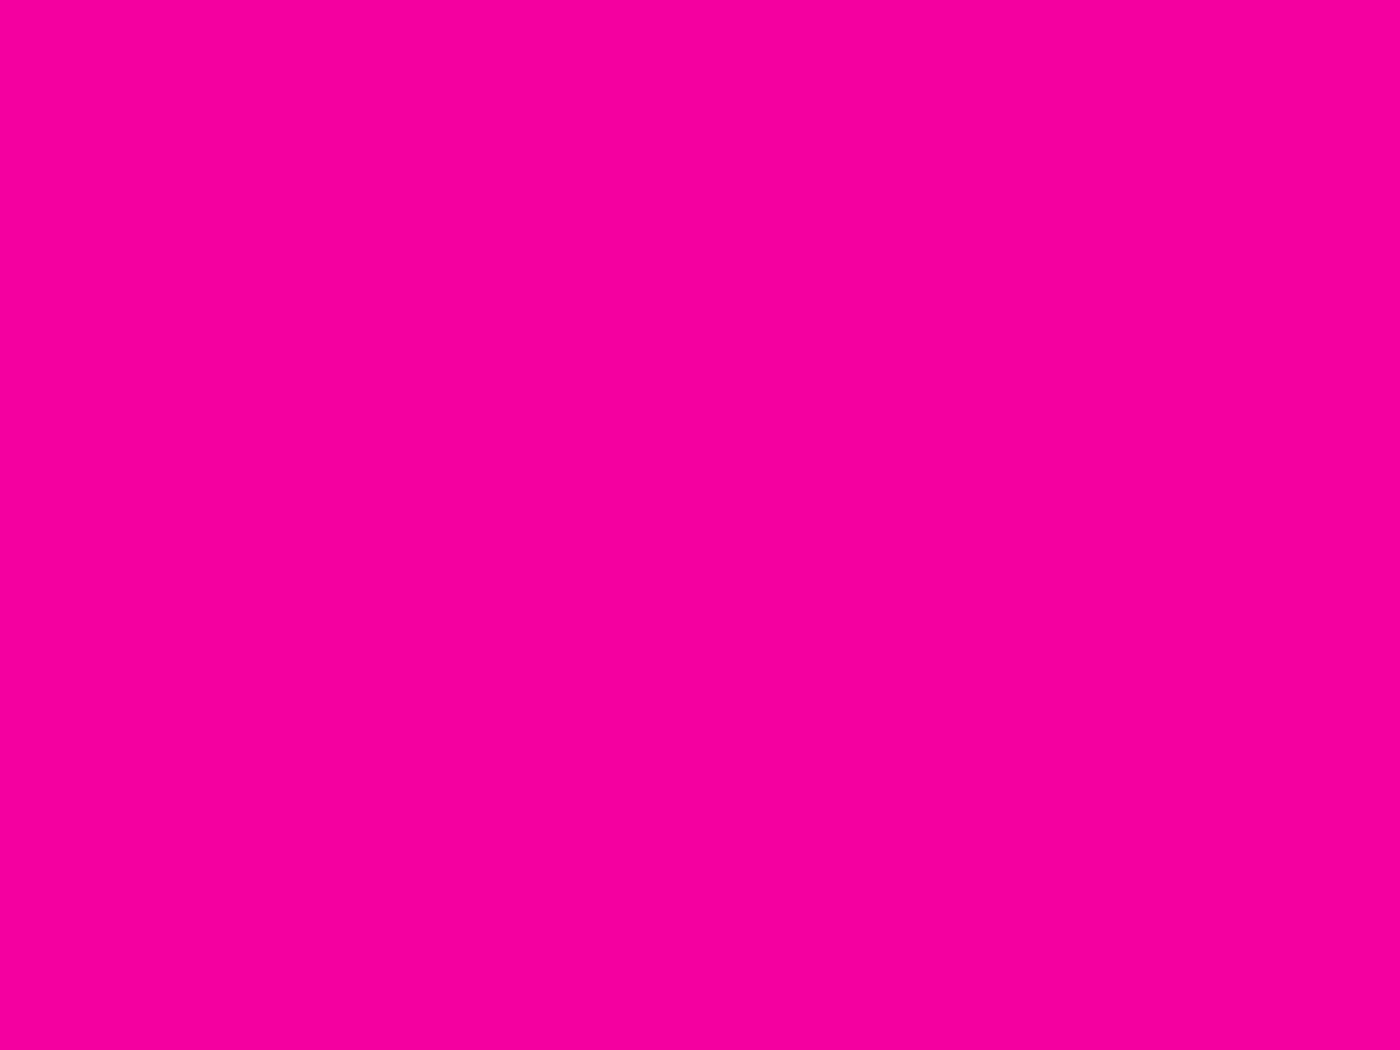 1400x1050 Fashion Fuchsia Solid Color Background